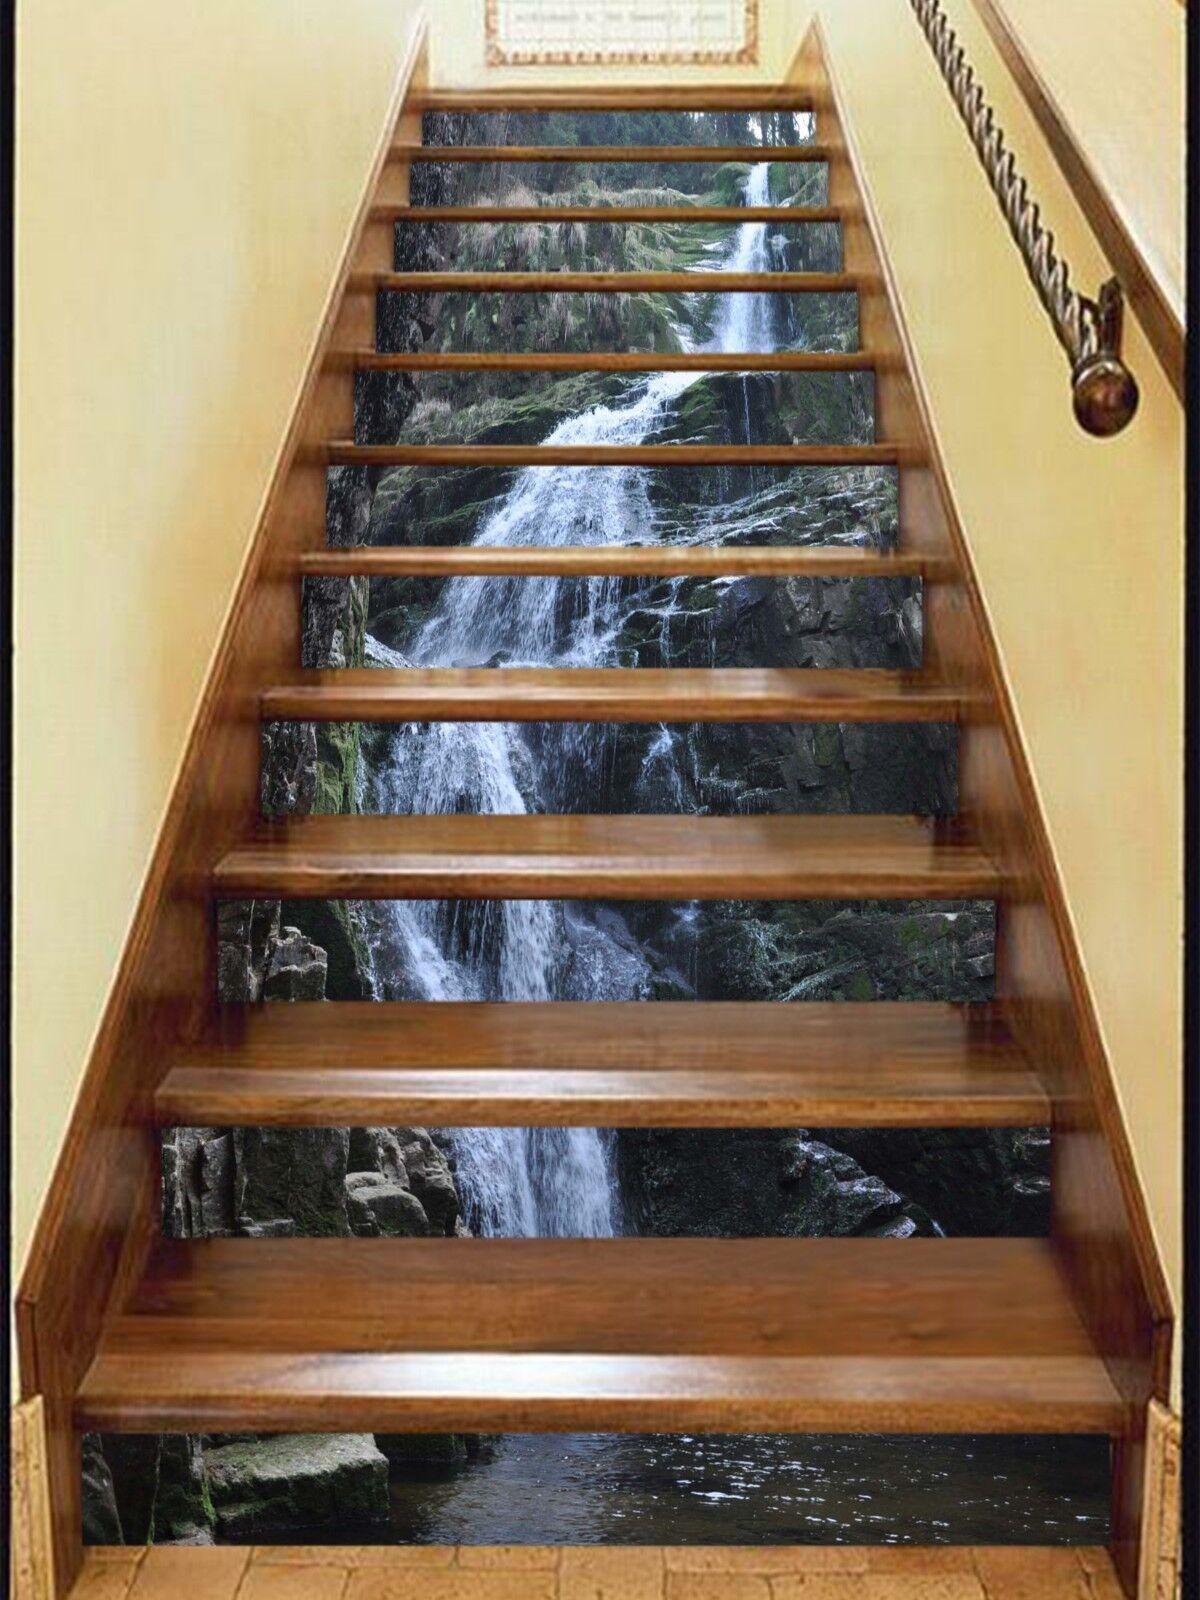 3D Waterfall 06 treppe aufsteher dekoration foto Mural Vinyl abziehbild wandpaper CA